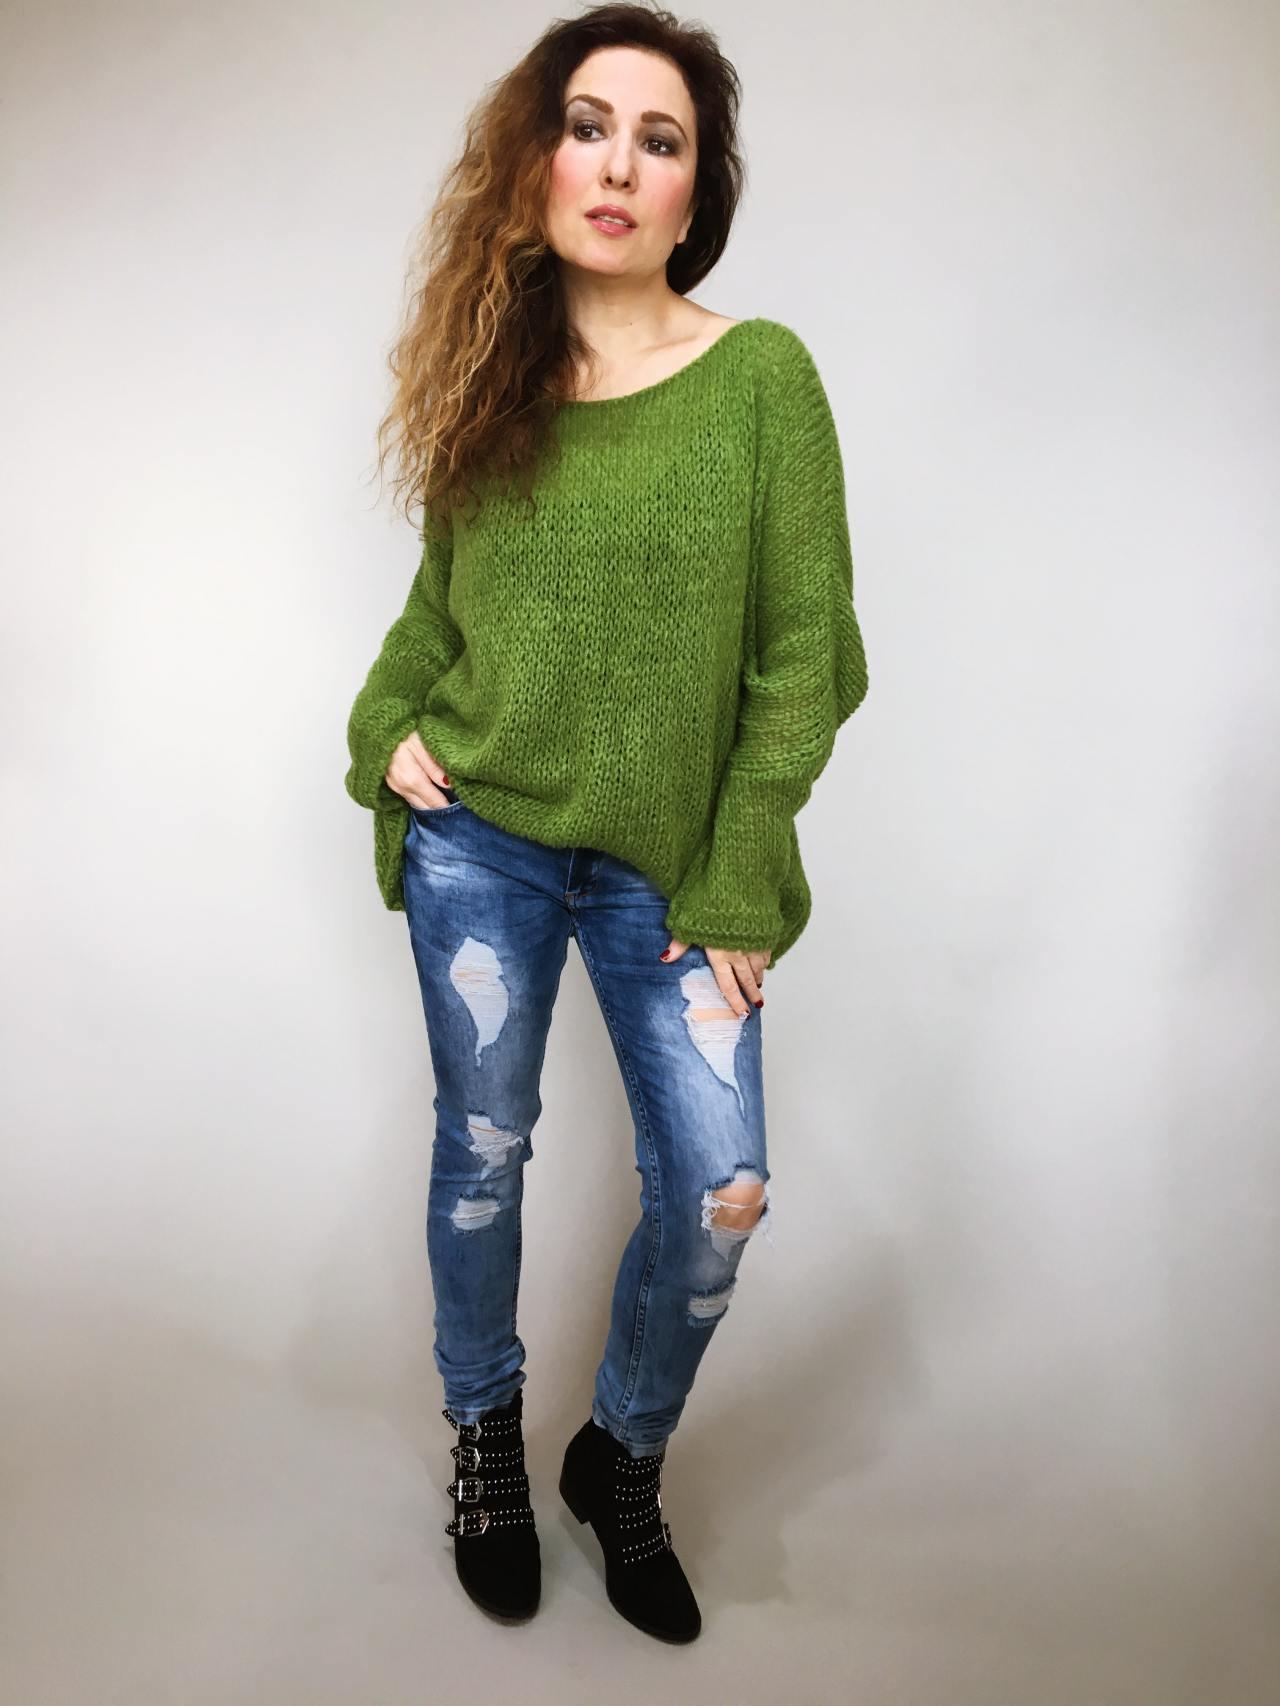 951bfb927a7 Zelený svetr Merlin – Simm-Fashion.cz